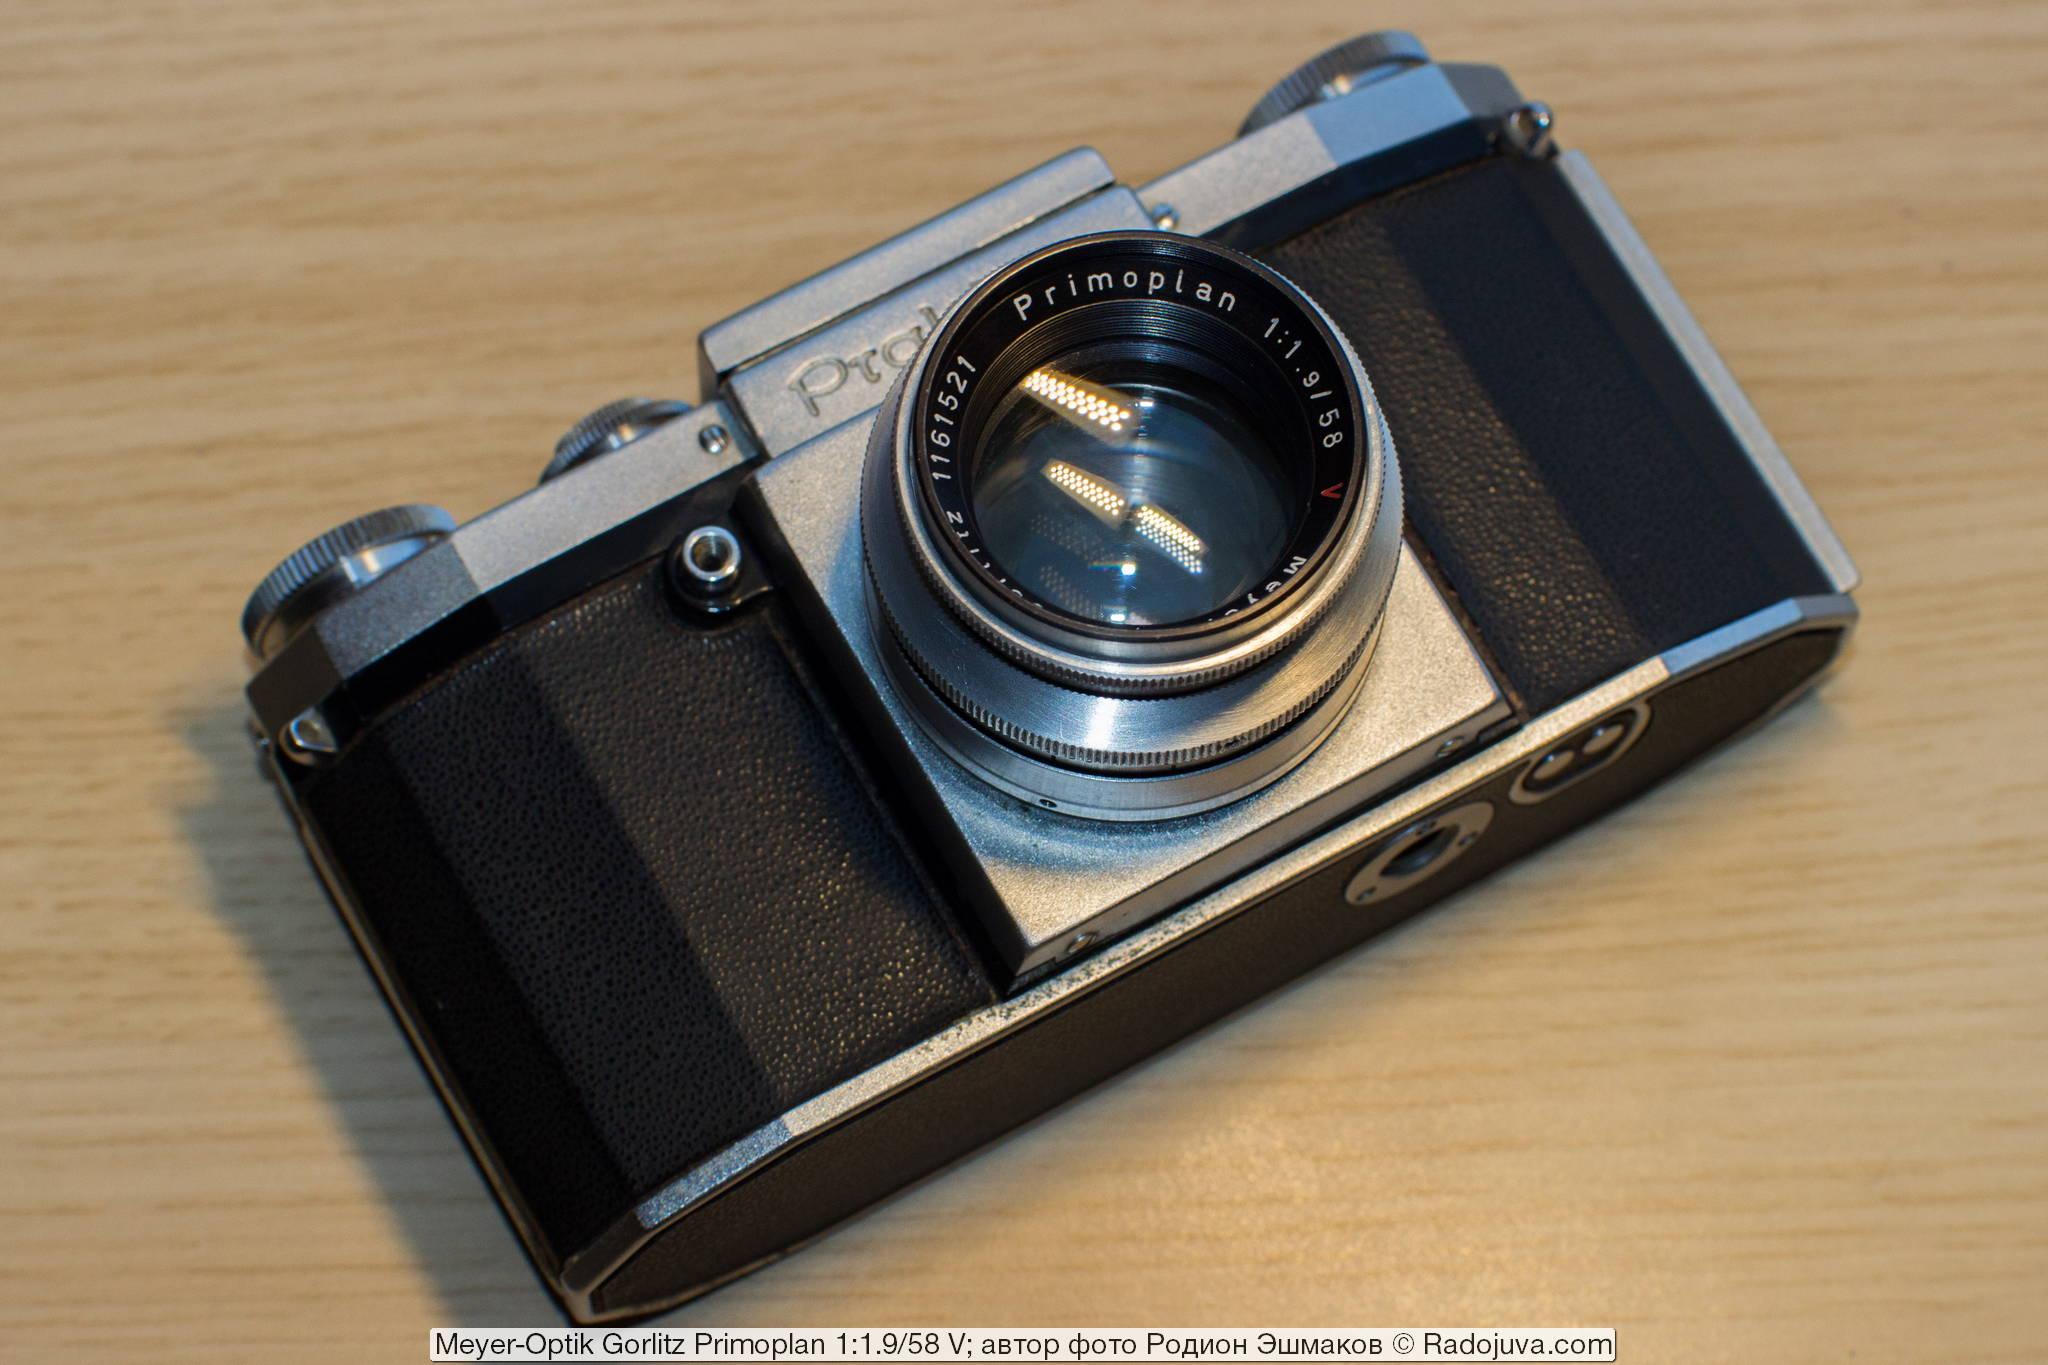 Зеркальная камера Praktica KW со штатным Primoplan 58/1.9